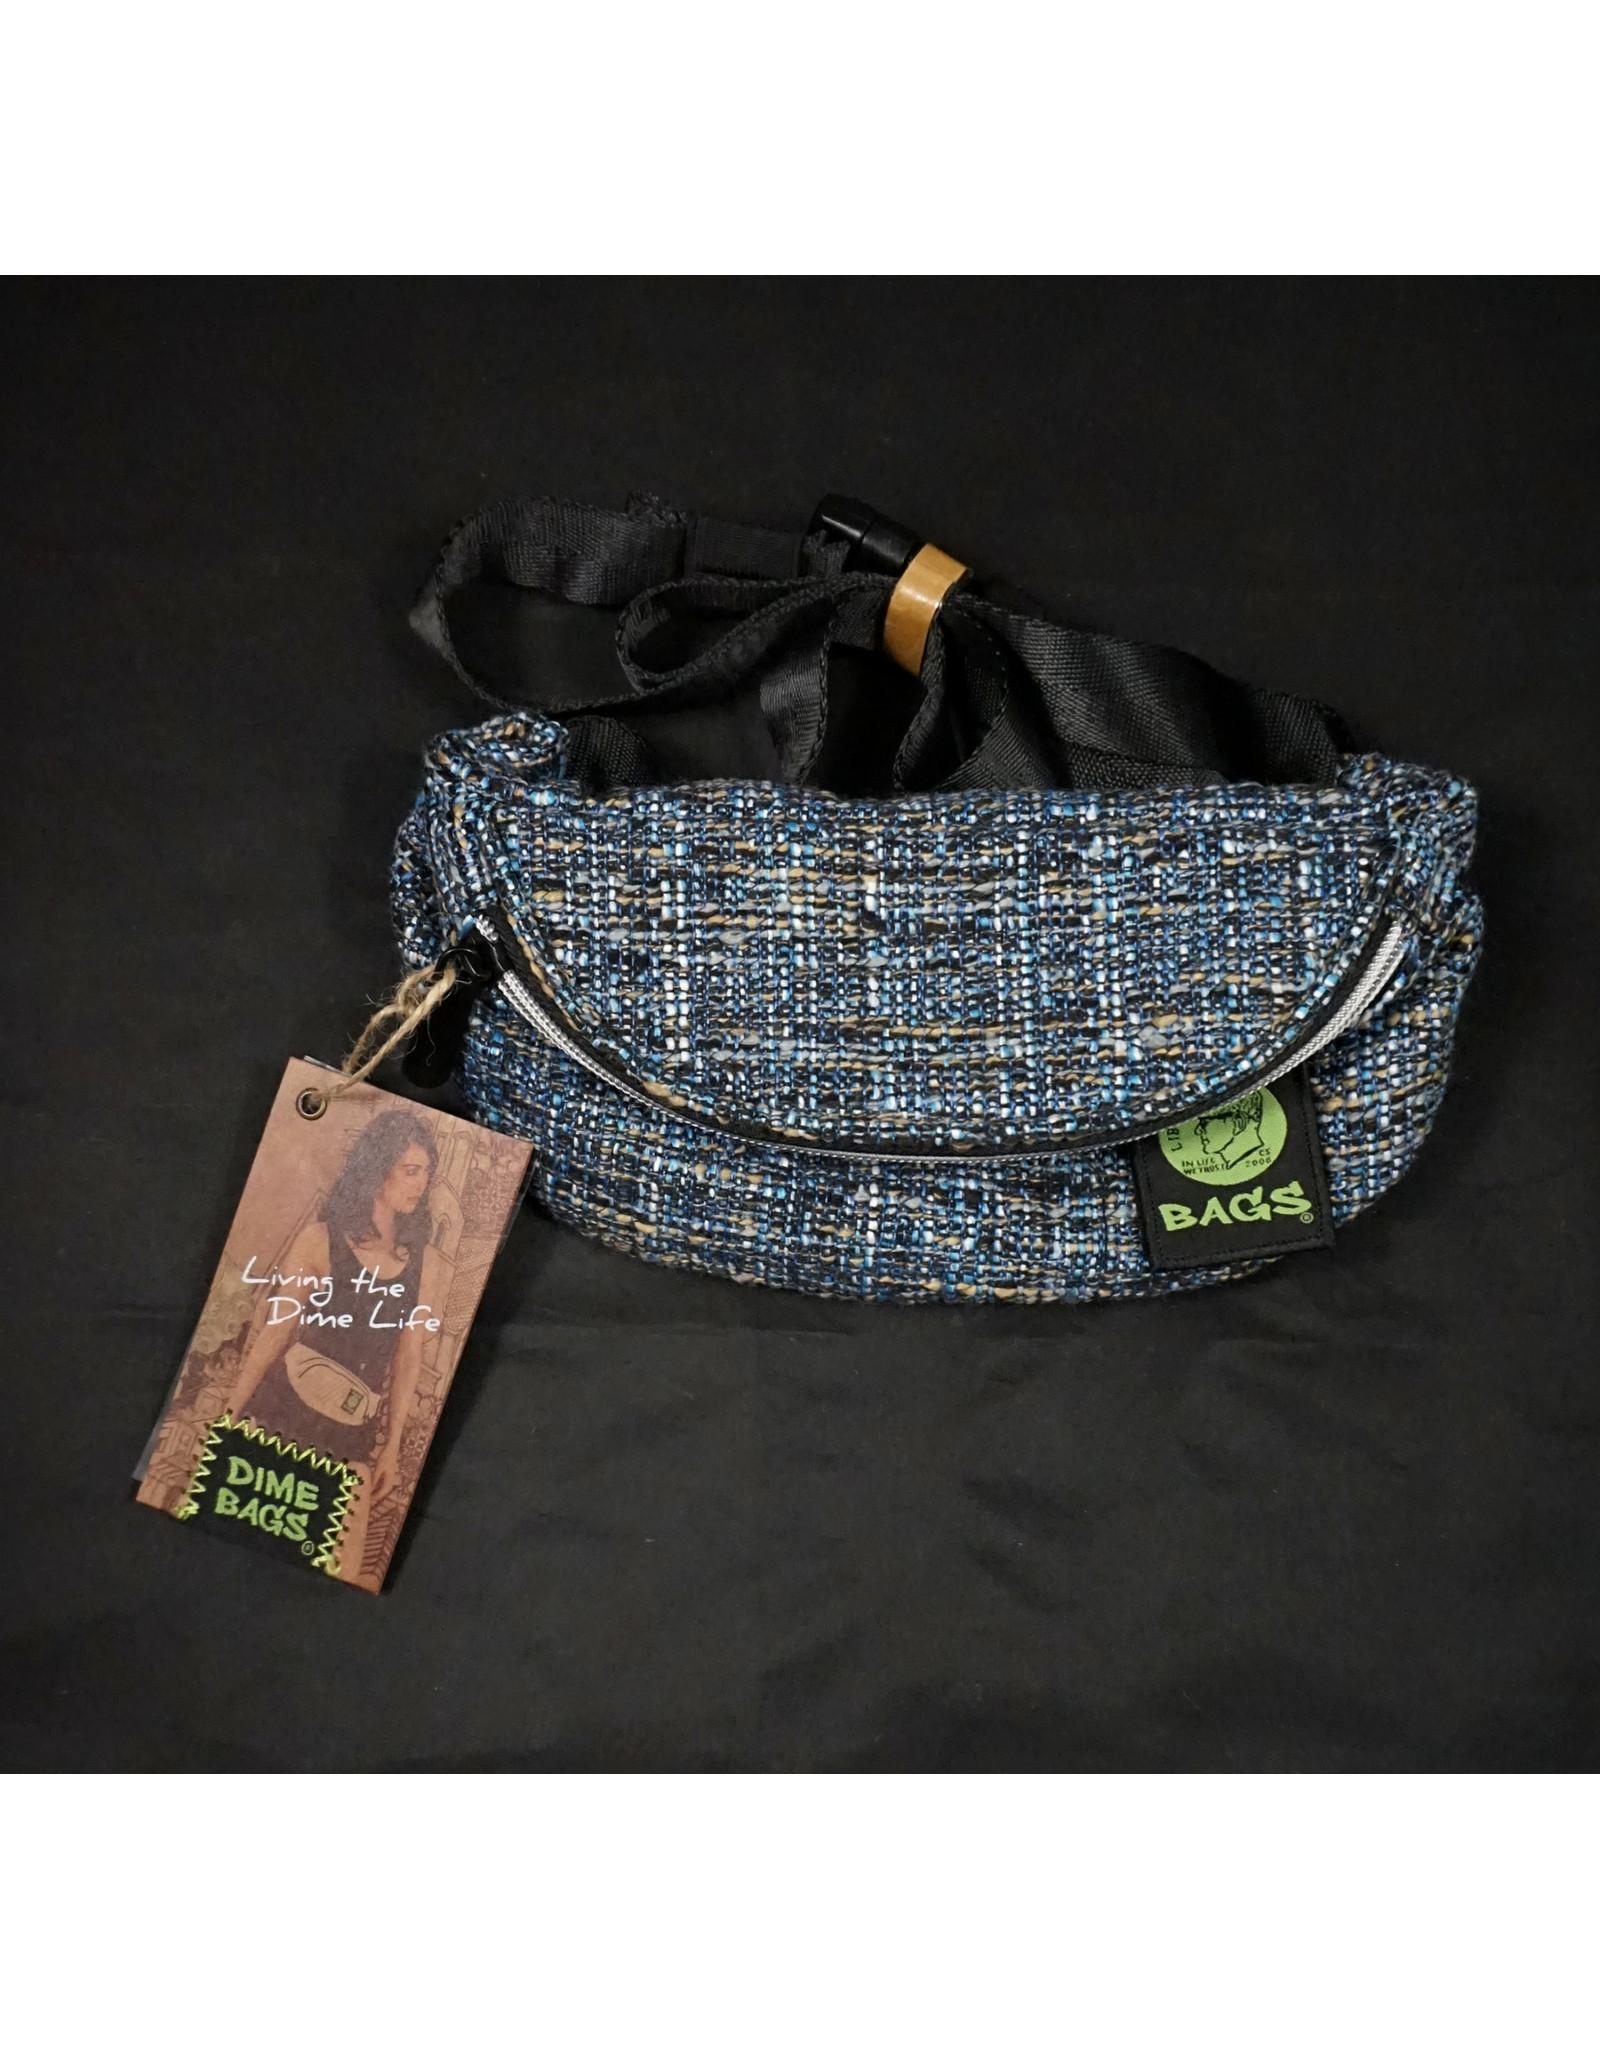 Dime Bags Dime Bags Stash Pack - Glass